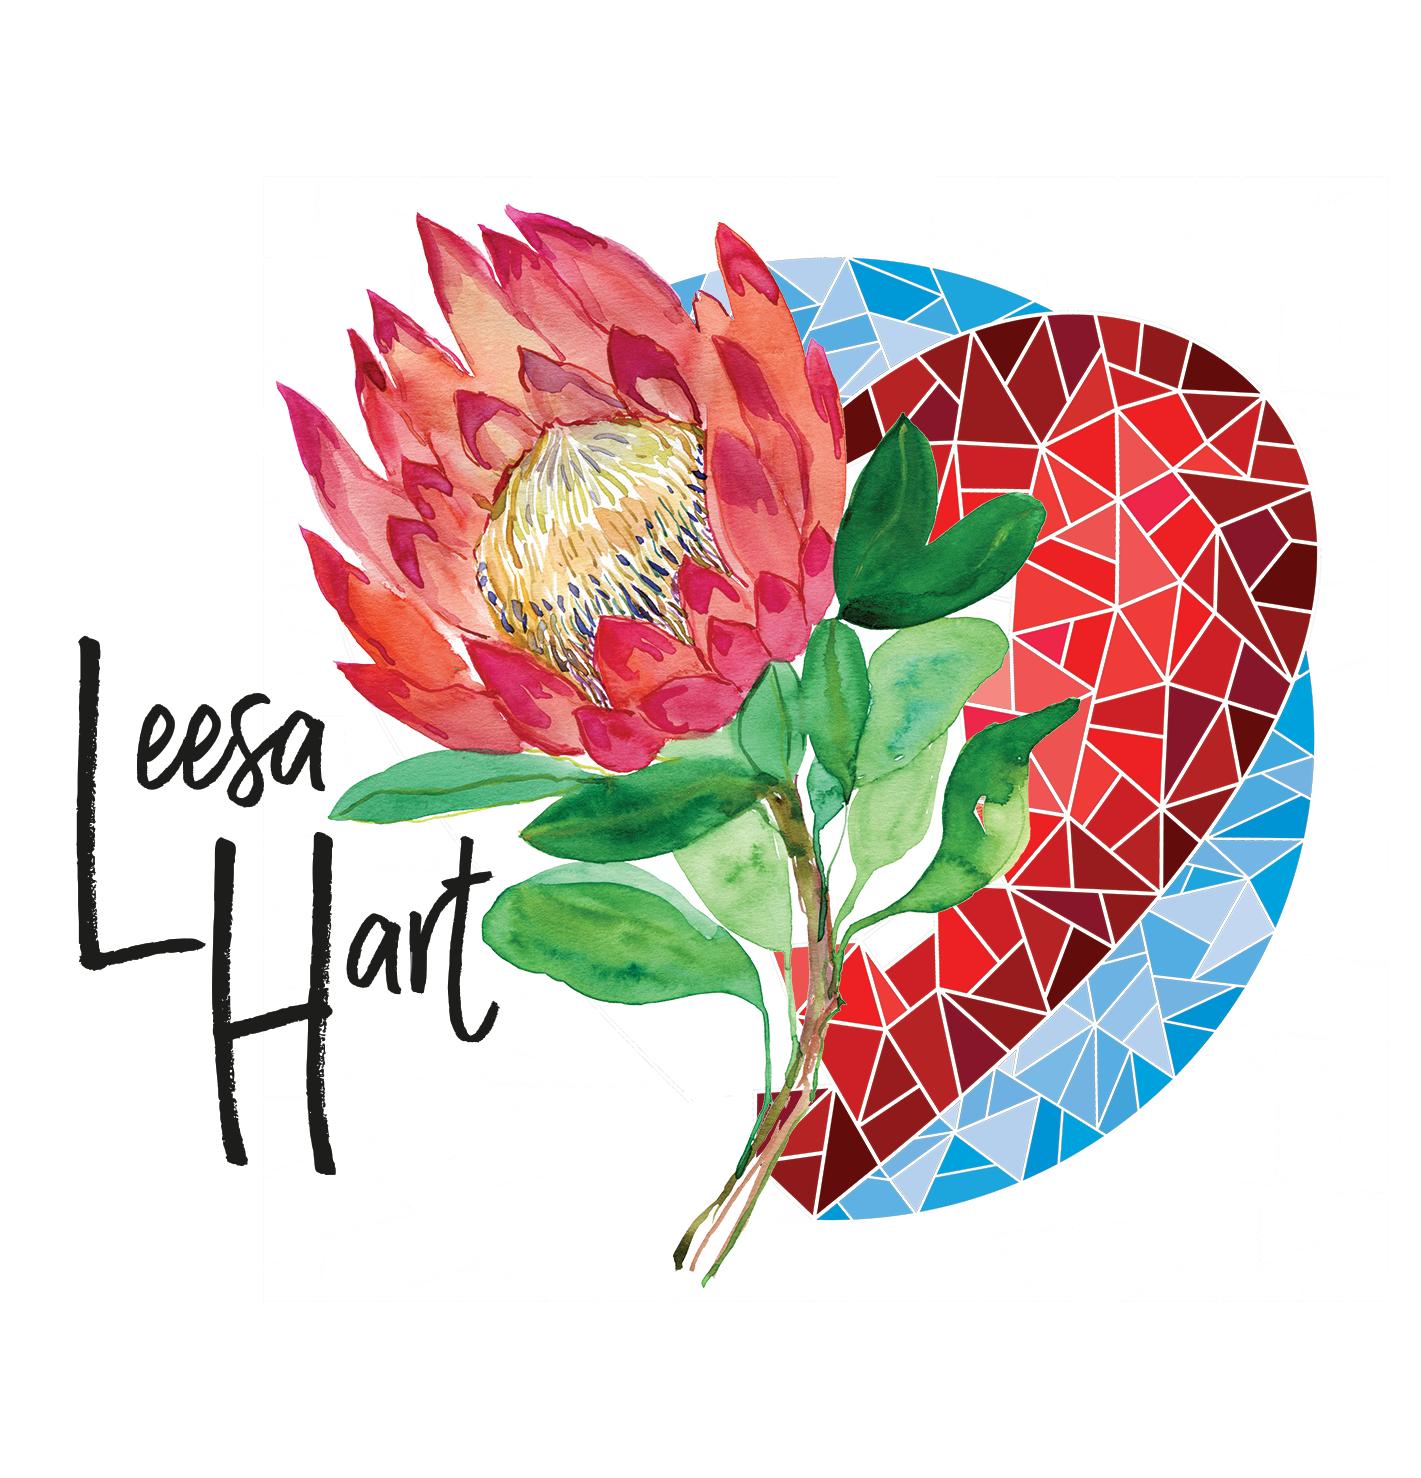 Leesa-Hart-Logo-Final.png